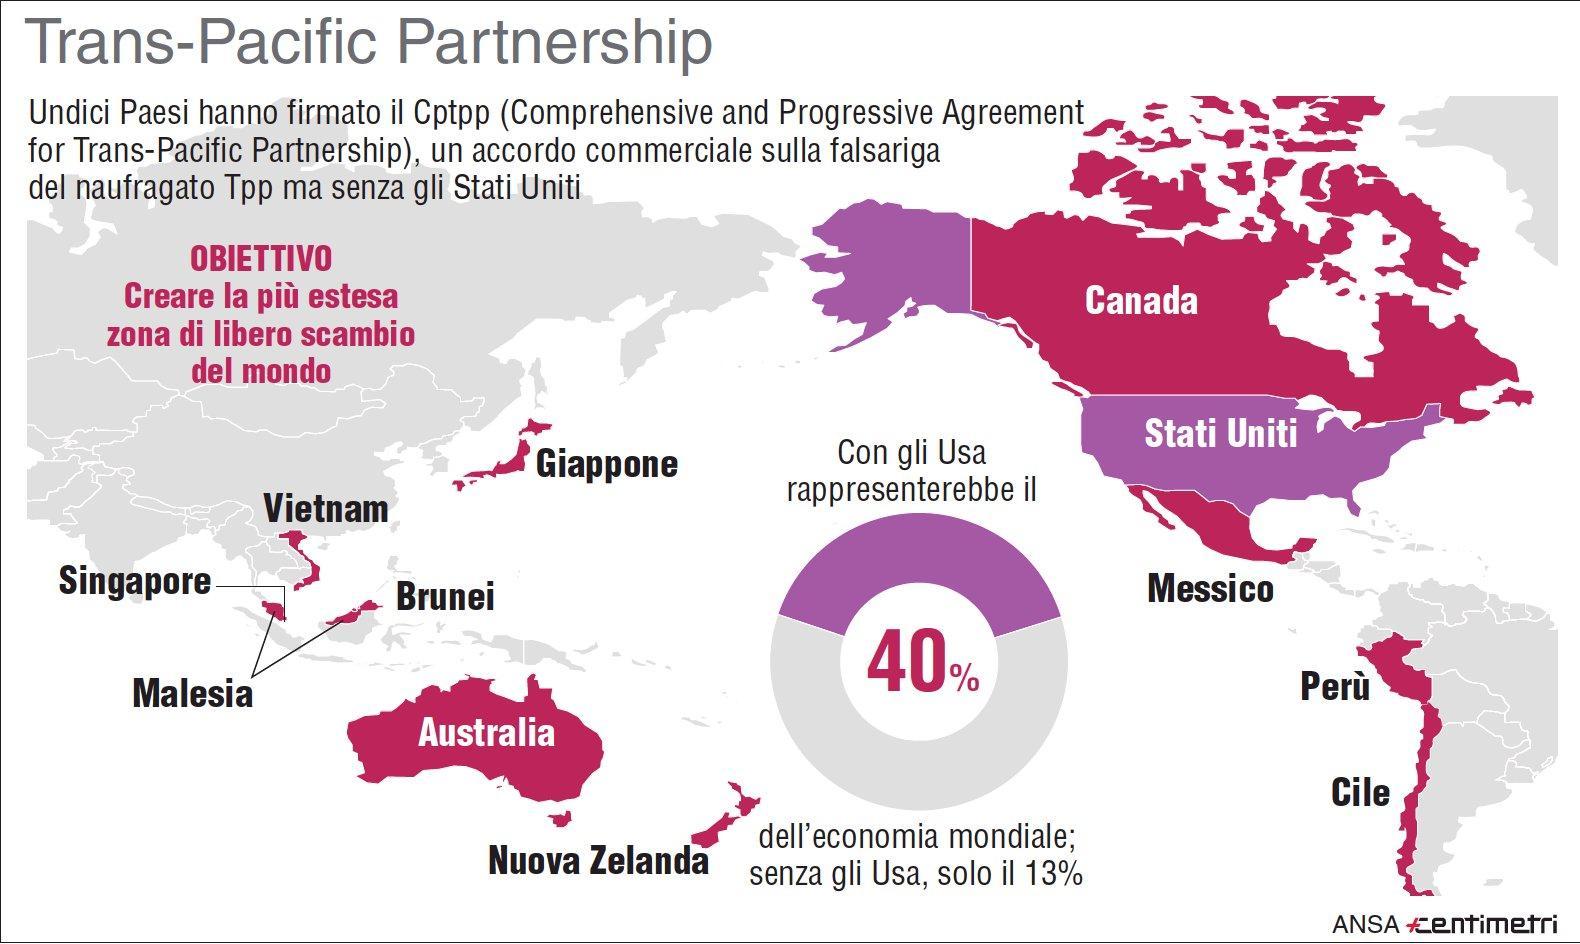 Trump vara dazi, 11 Paesi siglano accordo commerciale anti-Usa